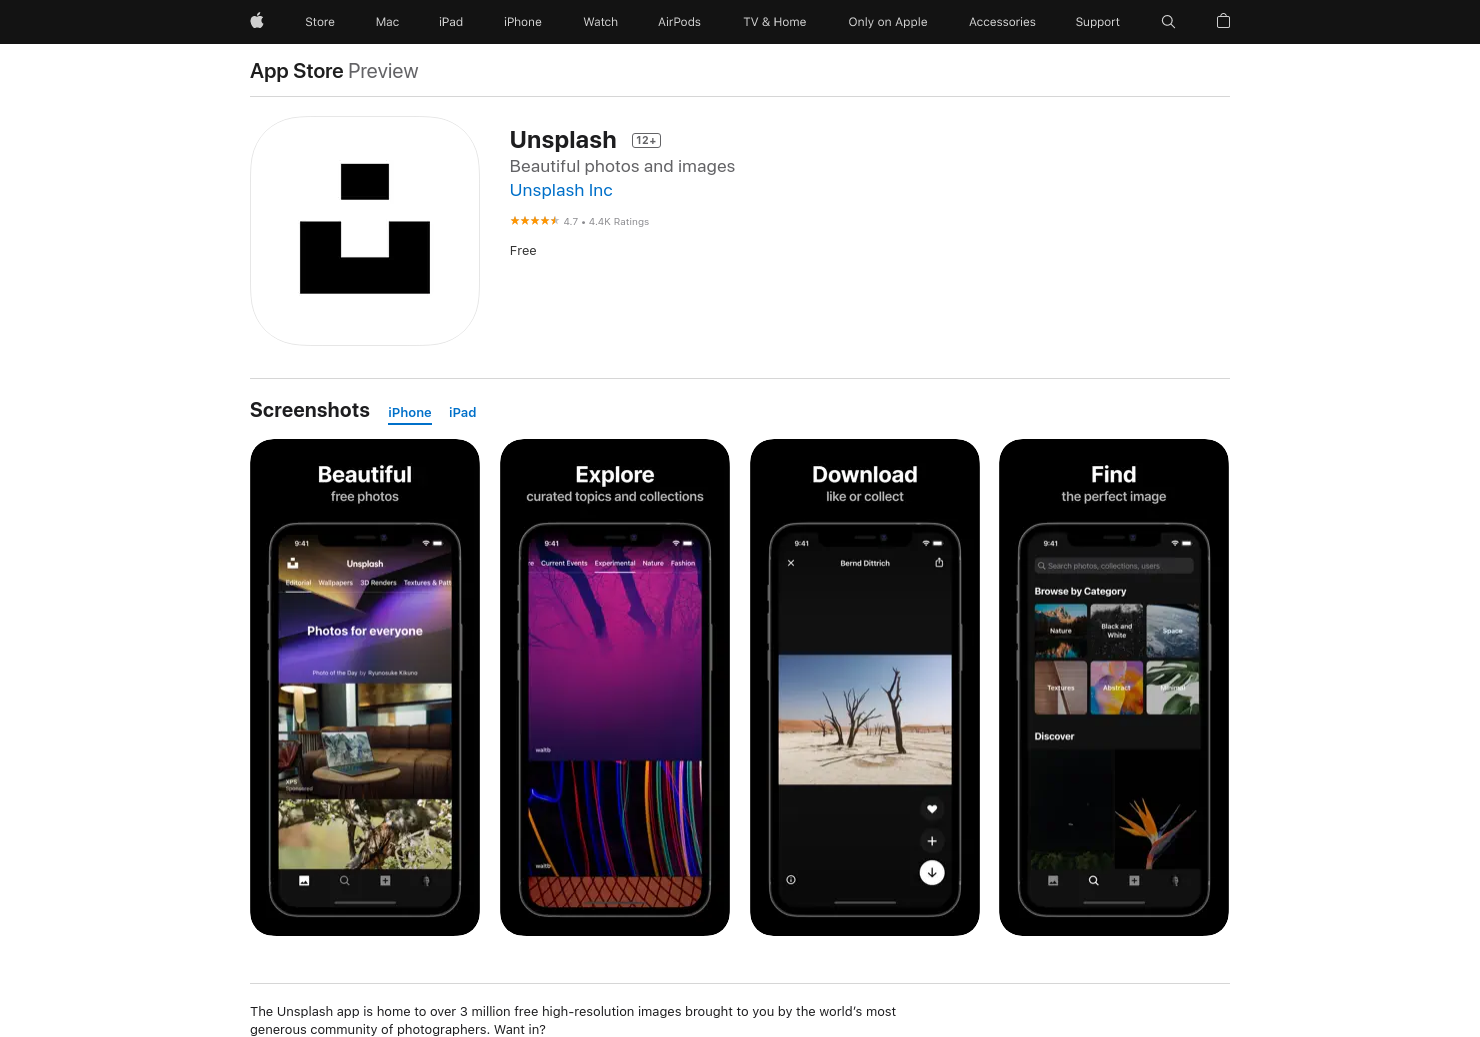 Unsplash for iOS 2.0